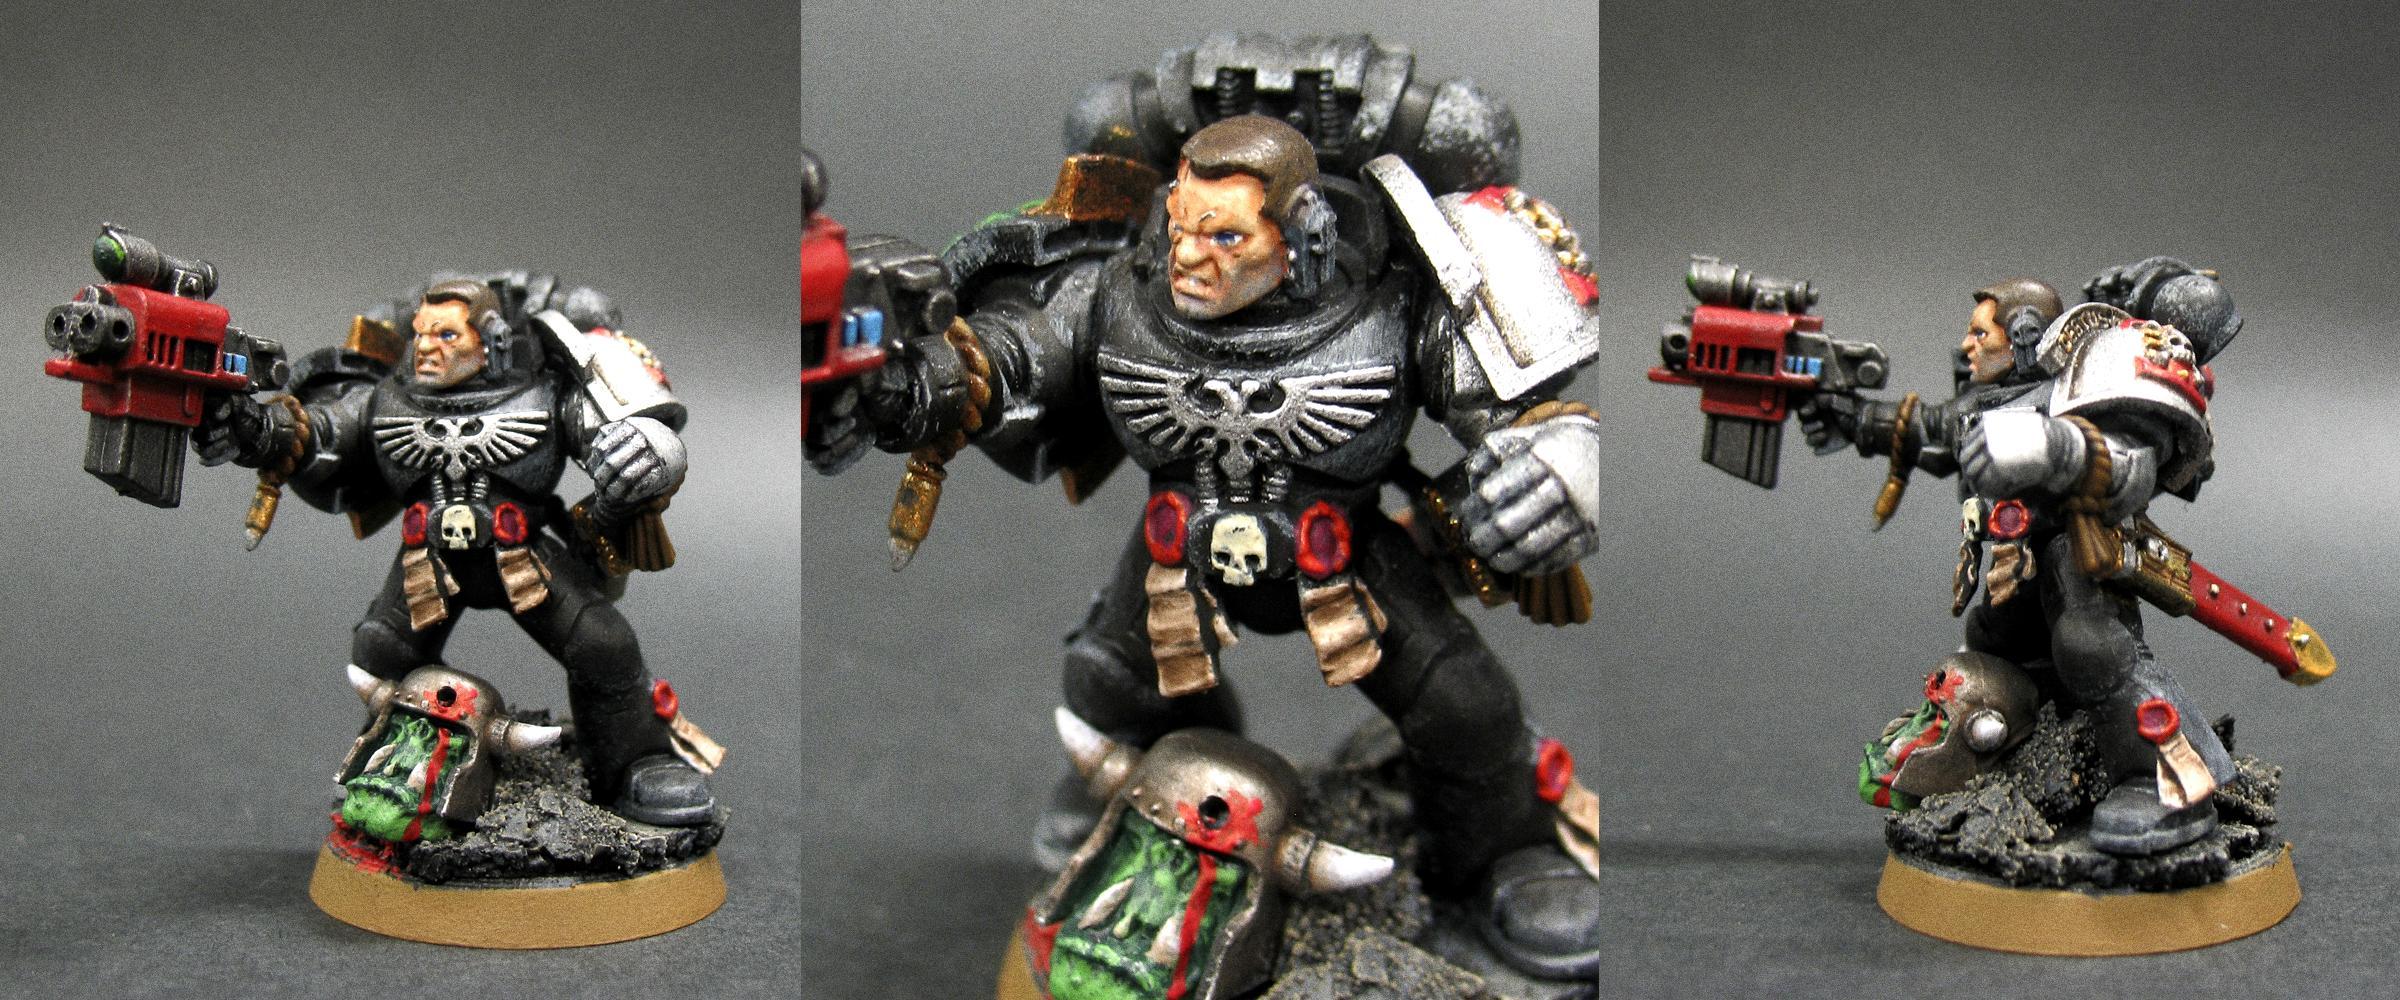 Blackshield, Captain Titus, Deathwatch, Killteam, Ork Abuse, Ultramarines